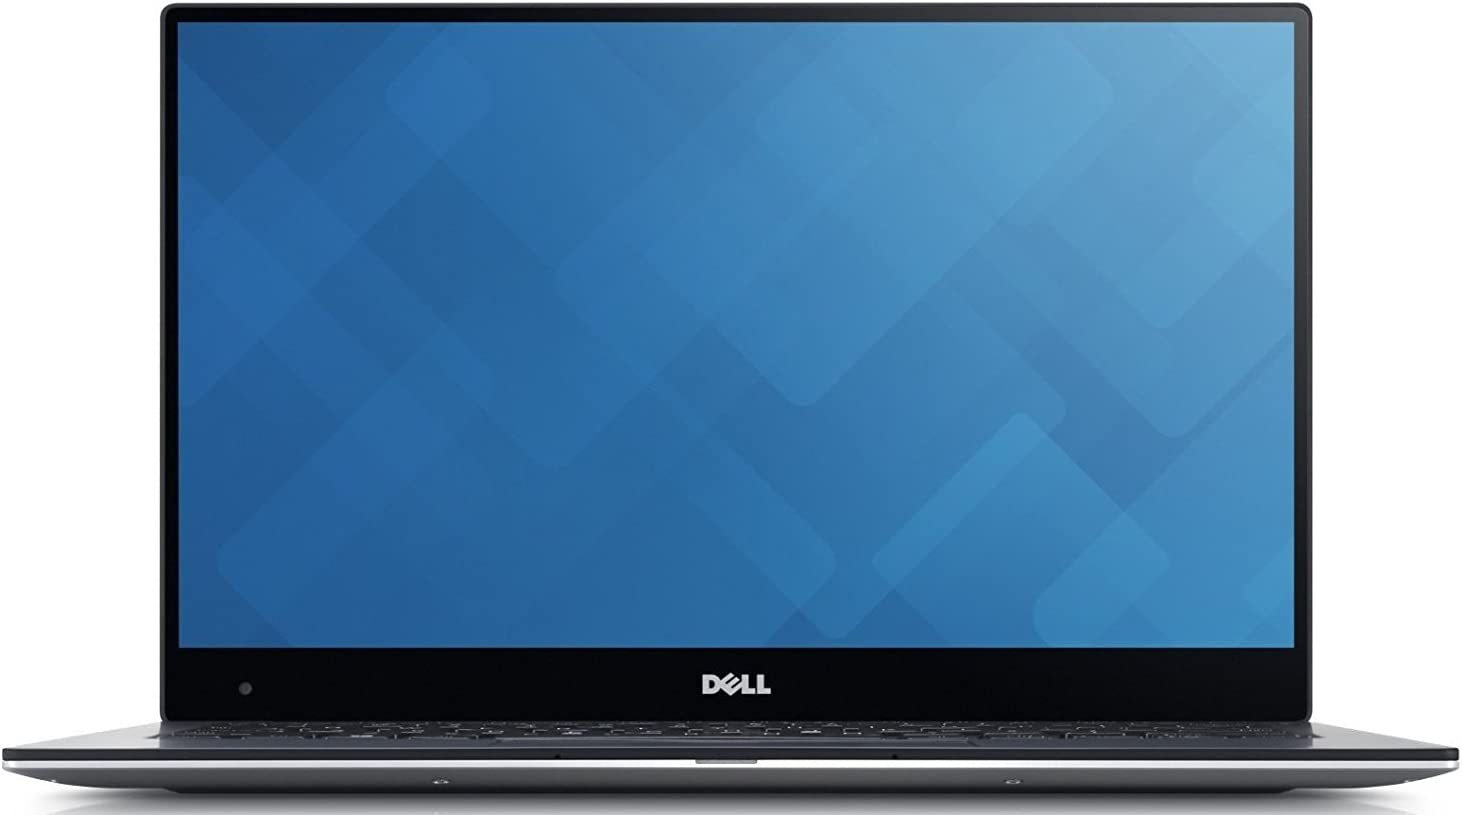 Dell XPS 13 9360 13.3in QHD+ TOUCH Laptop 7th Gen Intel Core i7-7560U, 16GB RAM, 512GB SSD Machined Aluminum Display Silver Win 10 (Renewed)